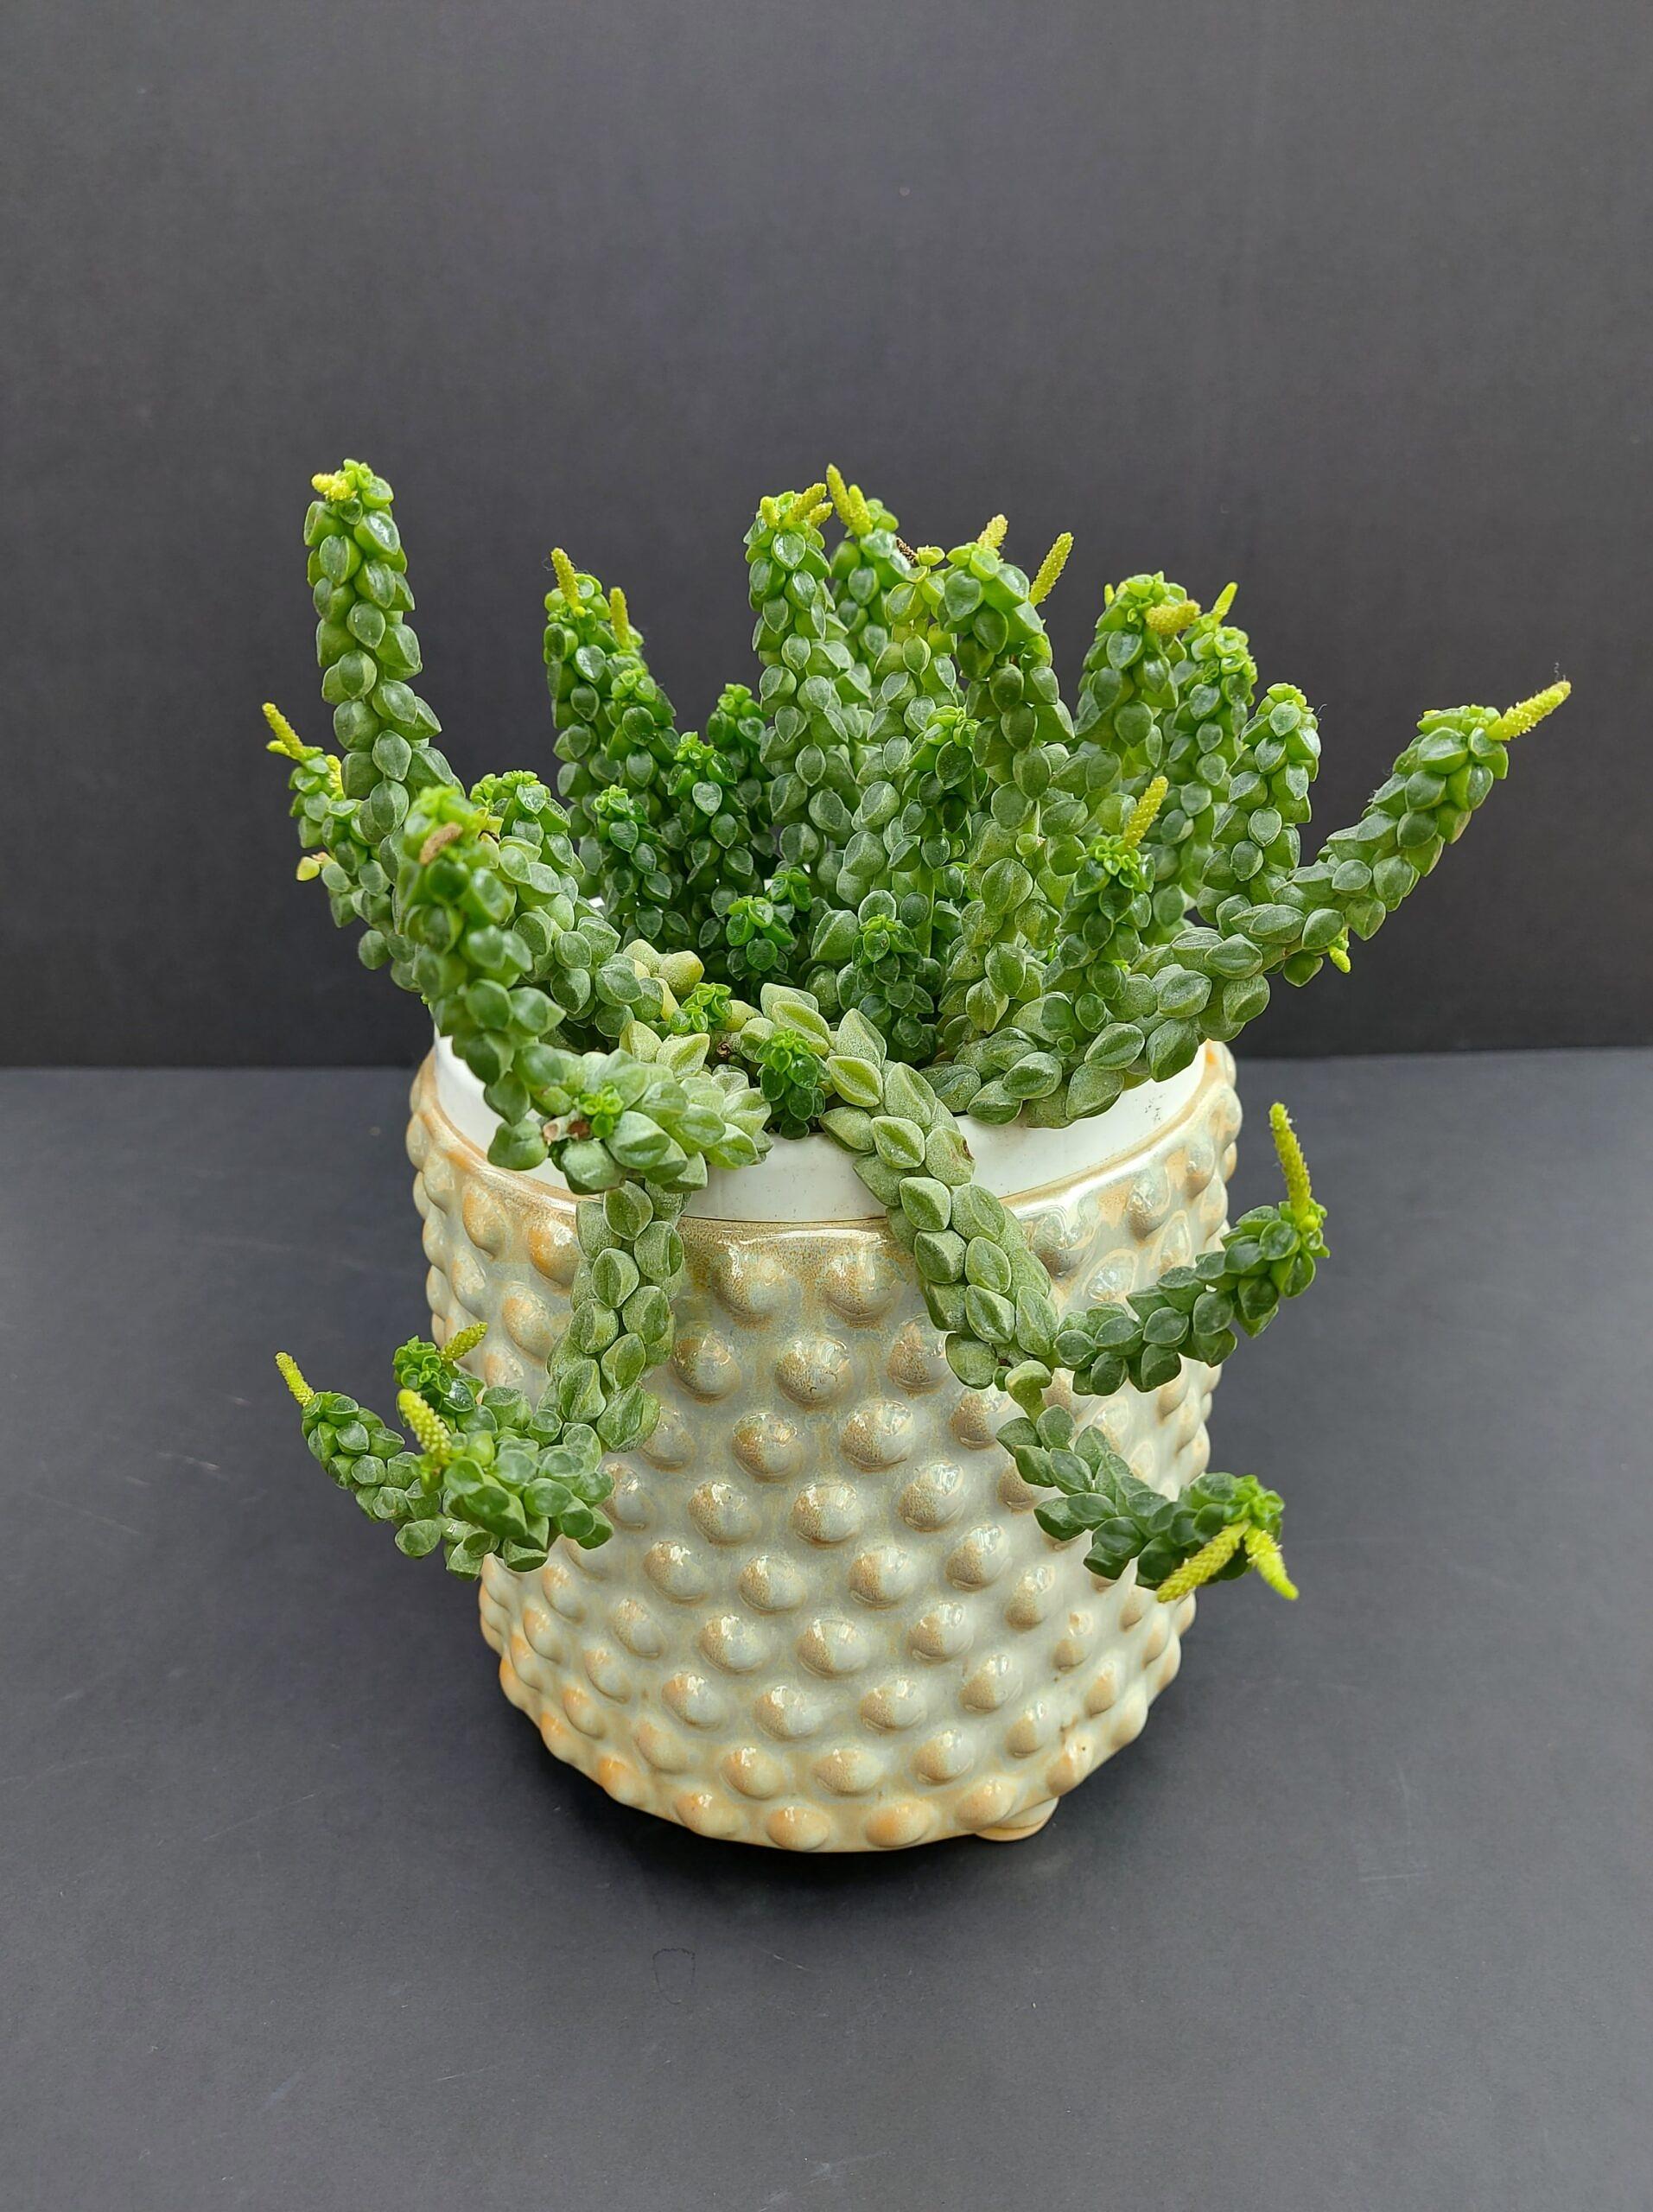 Peperomia Columella, sukulentai, sukulentu kompozicija, sukulentai vilniuje, augalai, augalu parduotuve, augalai vilniuje, sukulentai kaina, geles vilniuje, geles i namus